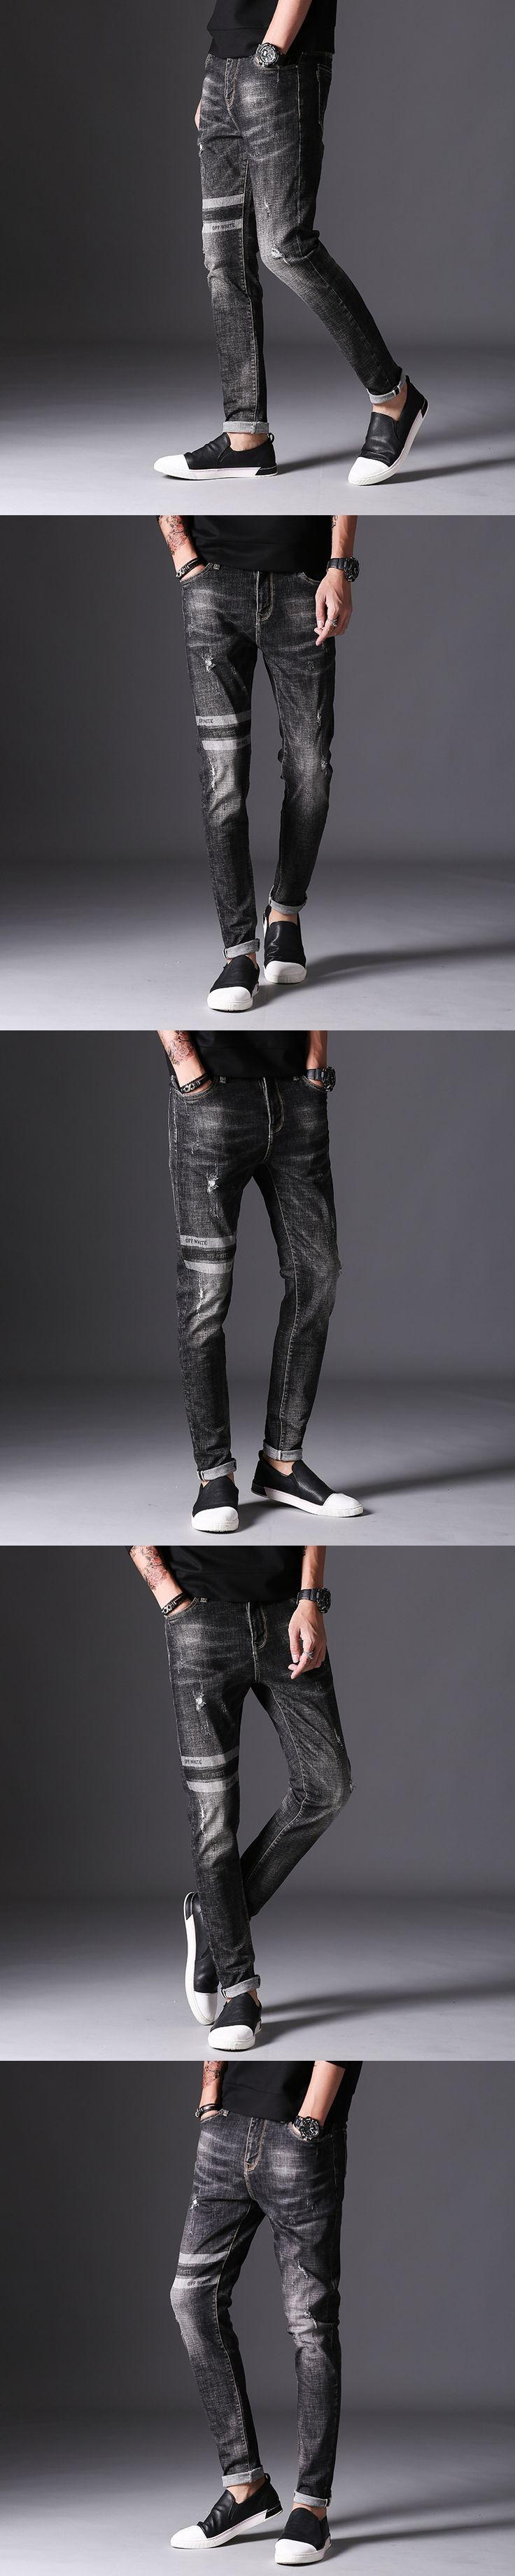 Sale Jeans Men Robin Biker Mens Distressed Overalls Fashion Jean Skinny Designer Clothes Brand Clothing Slim Full Length Solid